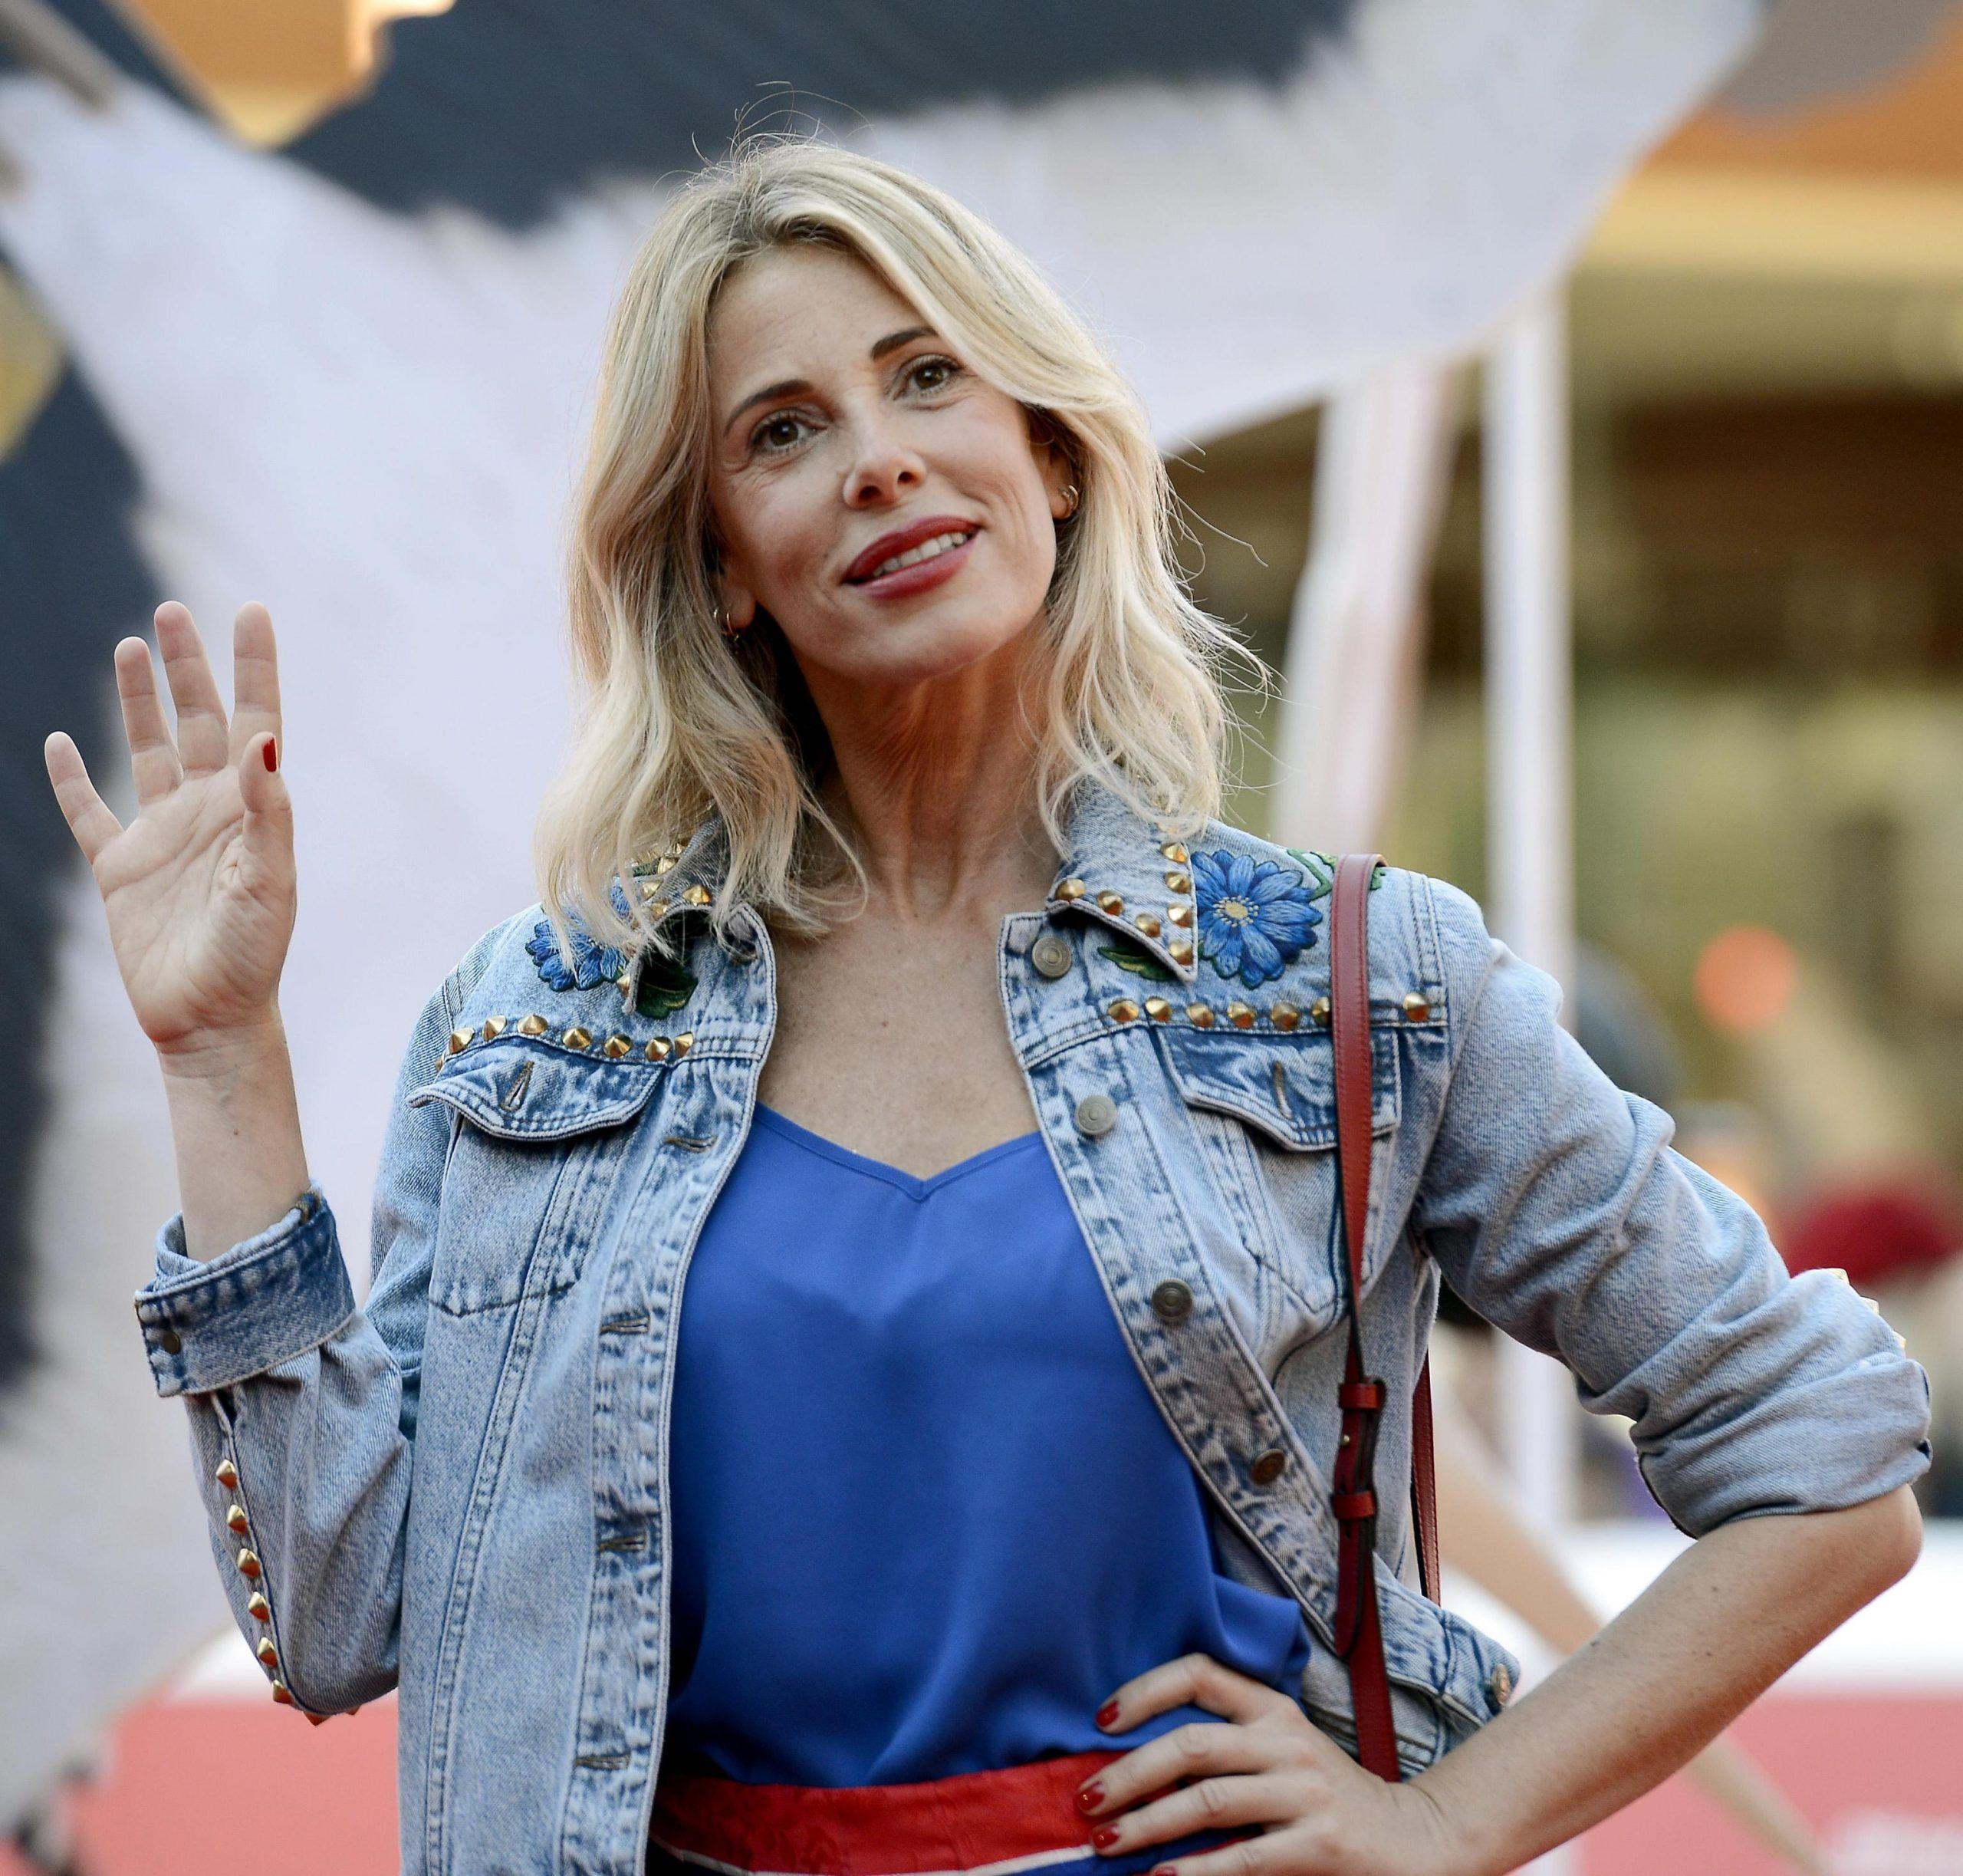 Alessia Marcuzzi: 'Lontana da Mediaset? Un trauma. I reality? Mi divertono ancora'